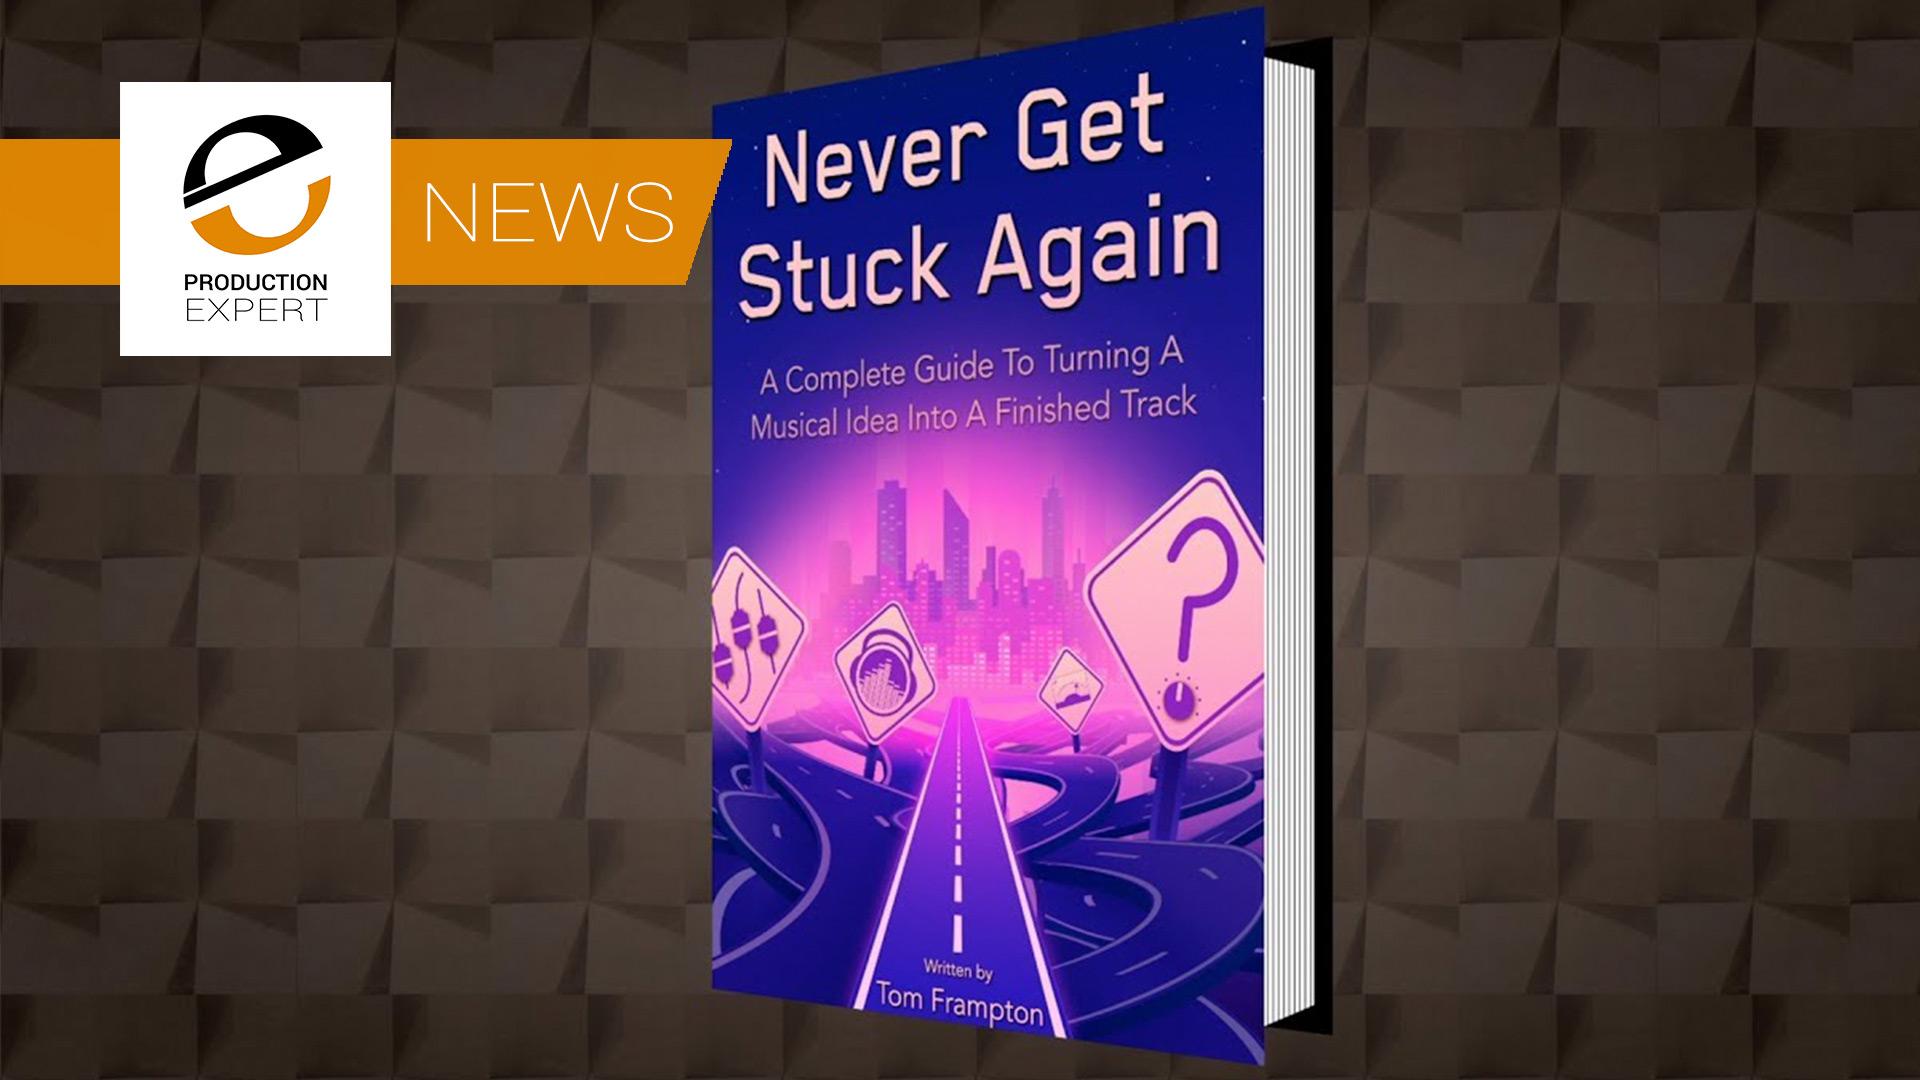 new-get-stuck-again-mixing-mastering-tutorial-ebook-audiobook-masteringthemix.jpg